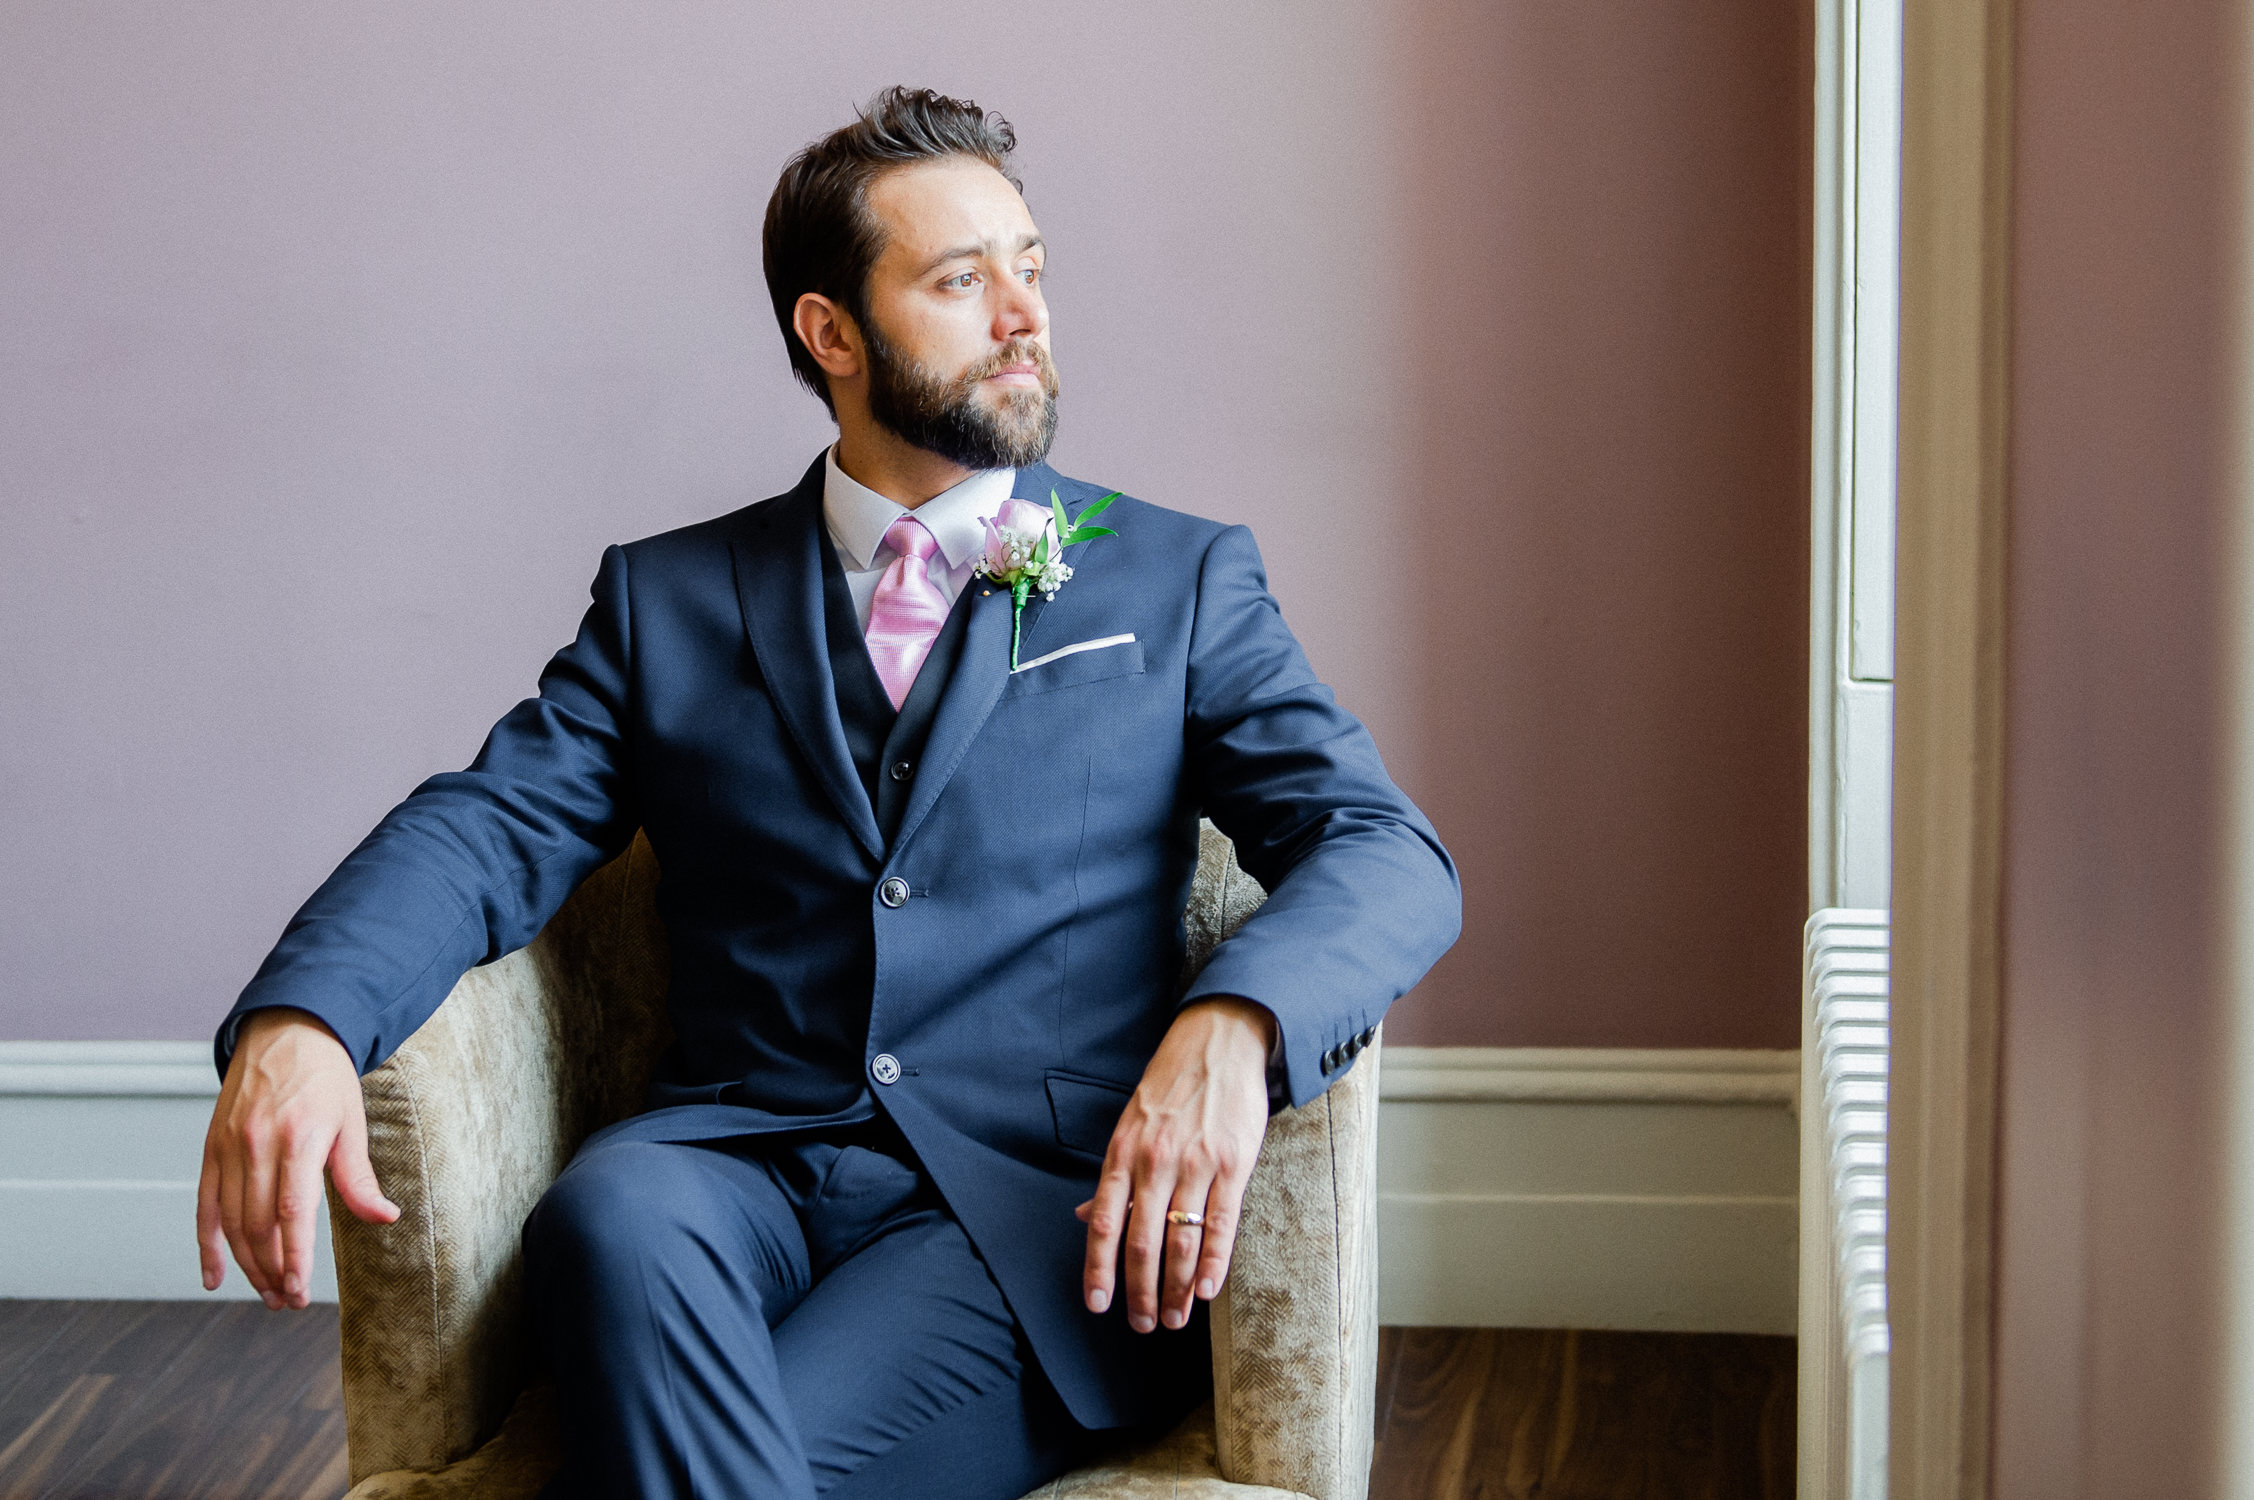 Morden hall wedding photographey